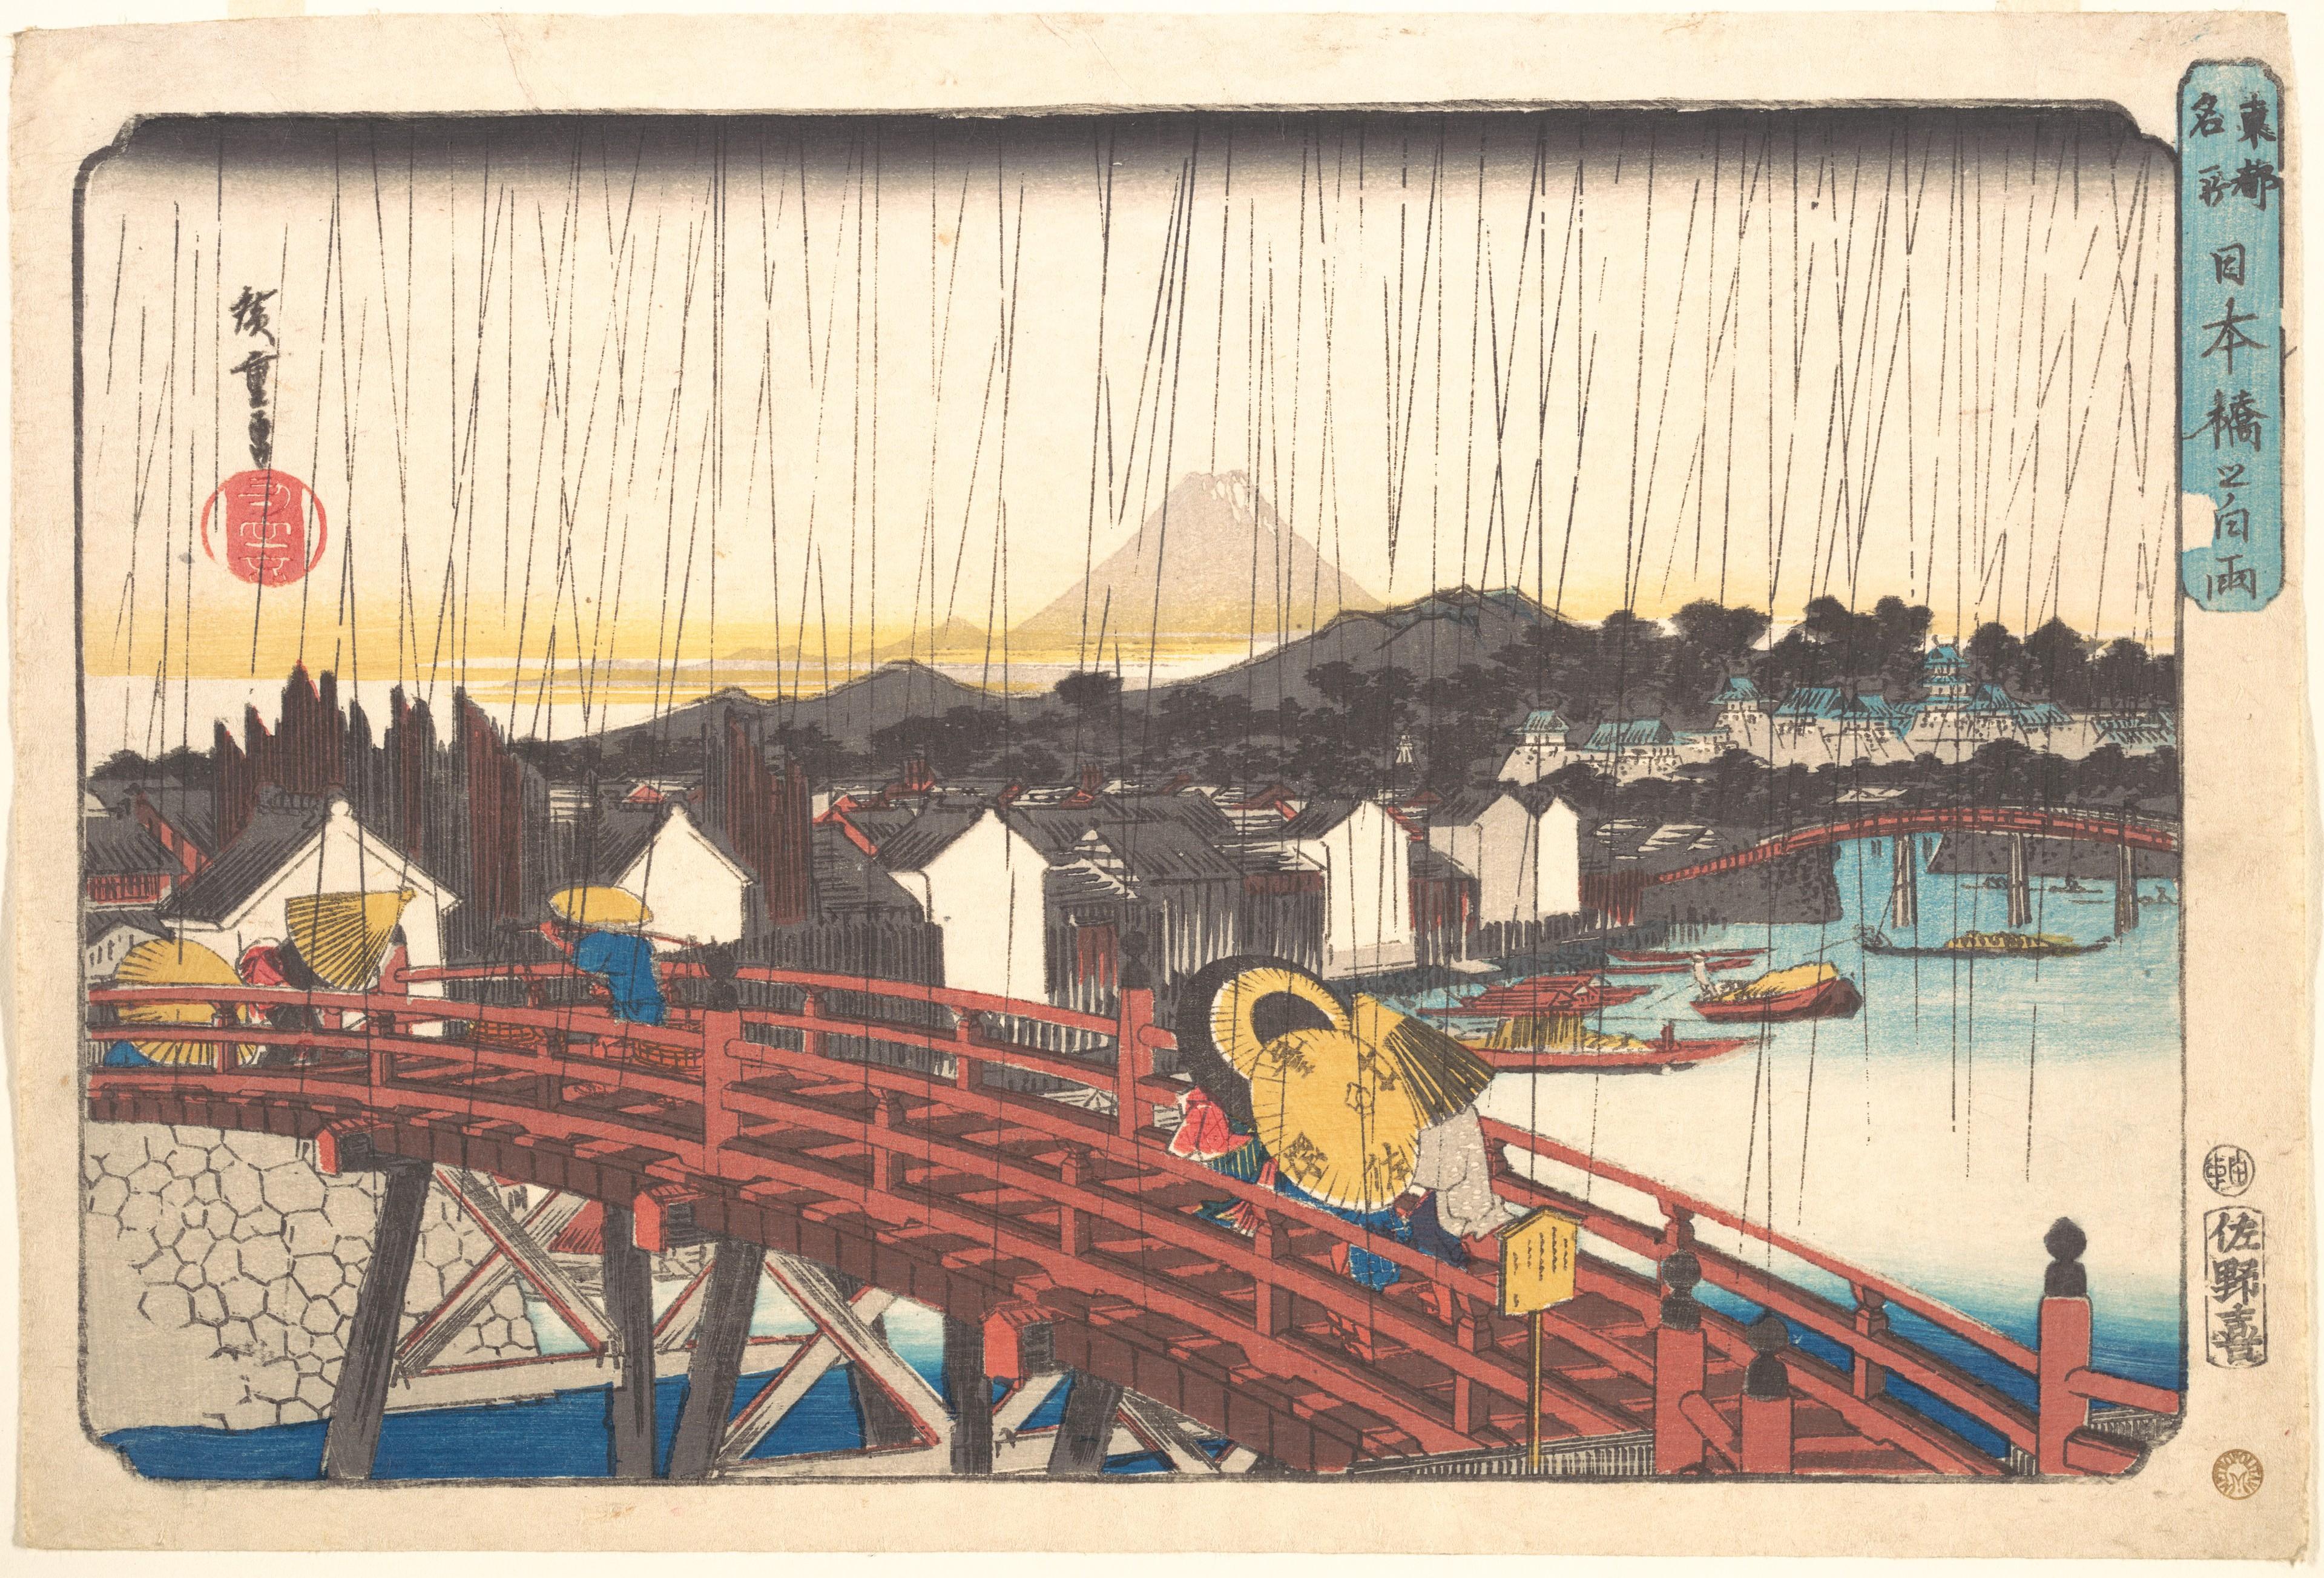 Utagawa Hiroshige Sunshower at Nihonbashi  Metropolitan Museum of Art  Uki # Sunshower Mia_061752